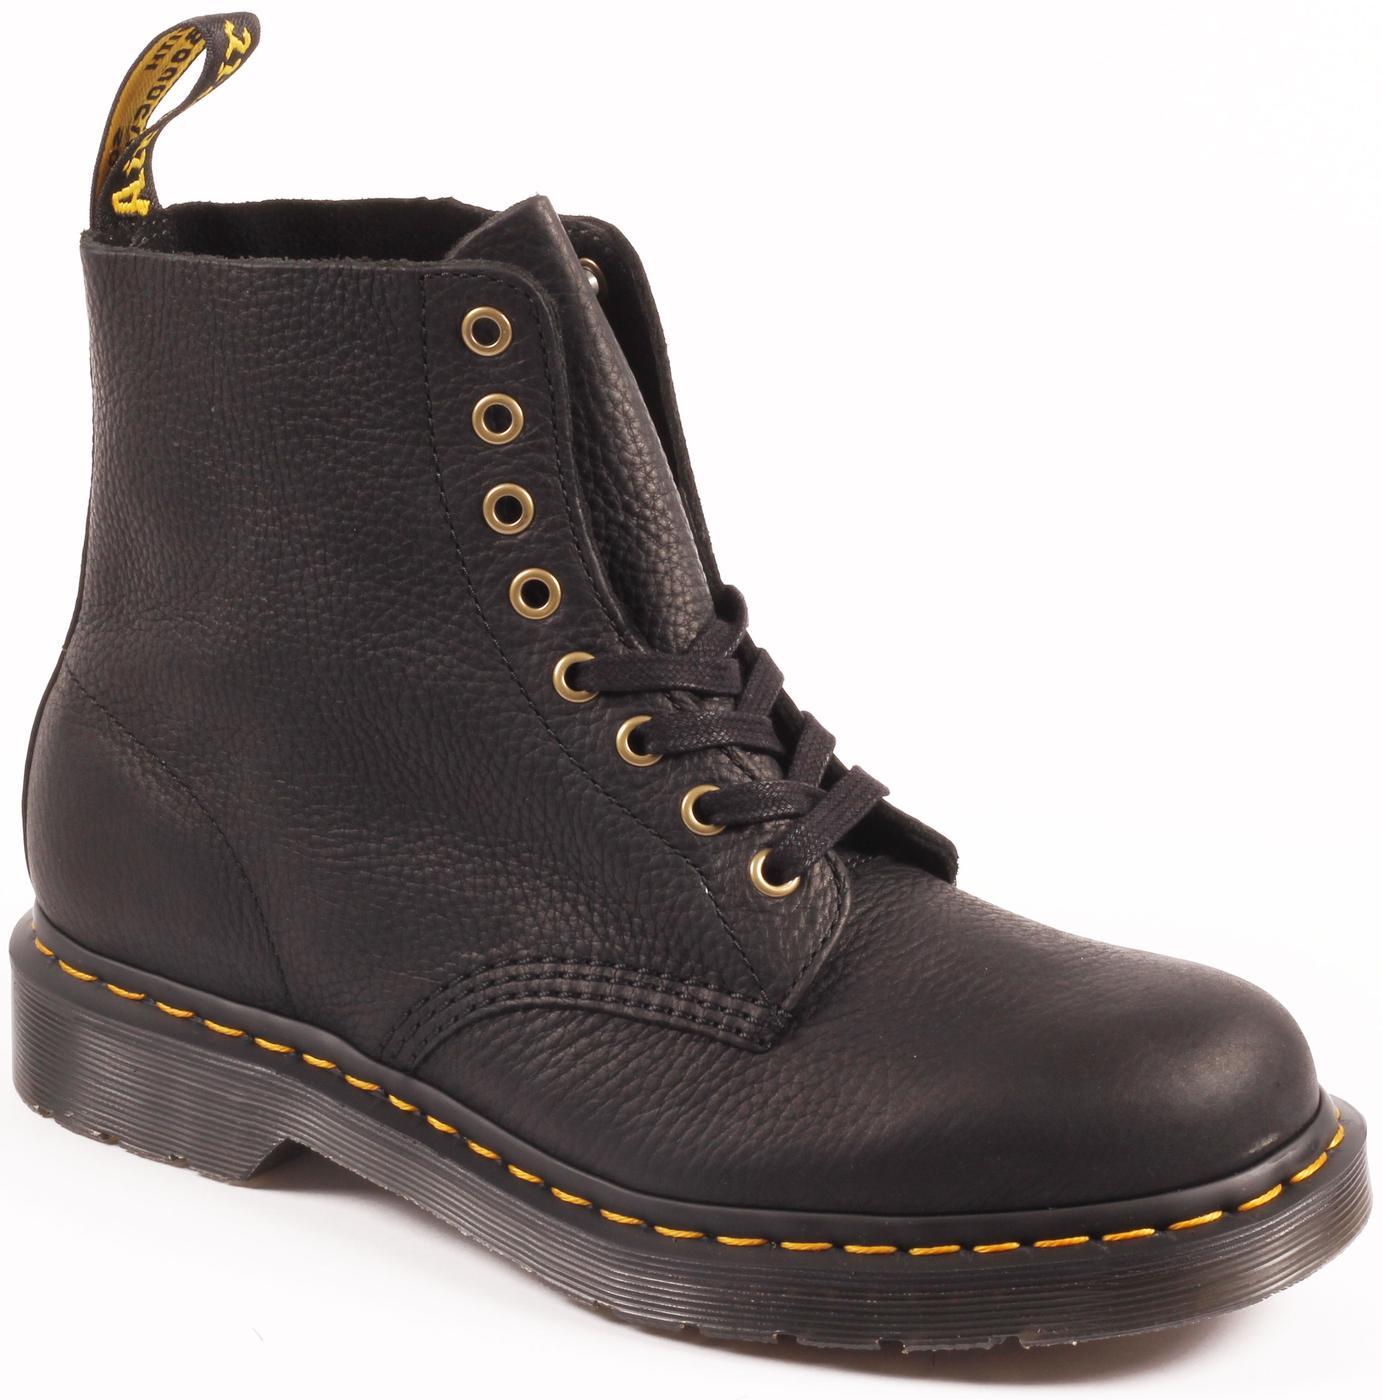 1460 Pascal DR MARTENS MENS Leather Boots BLACK